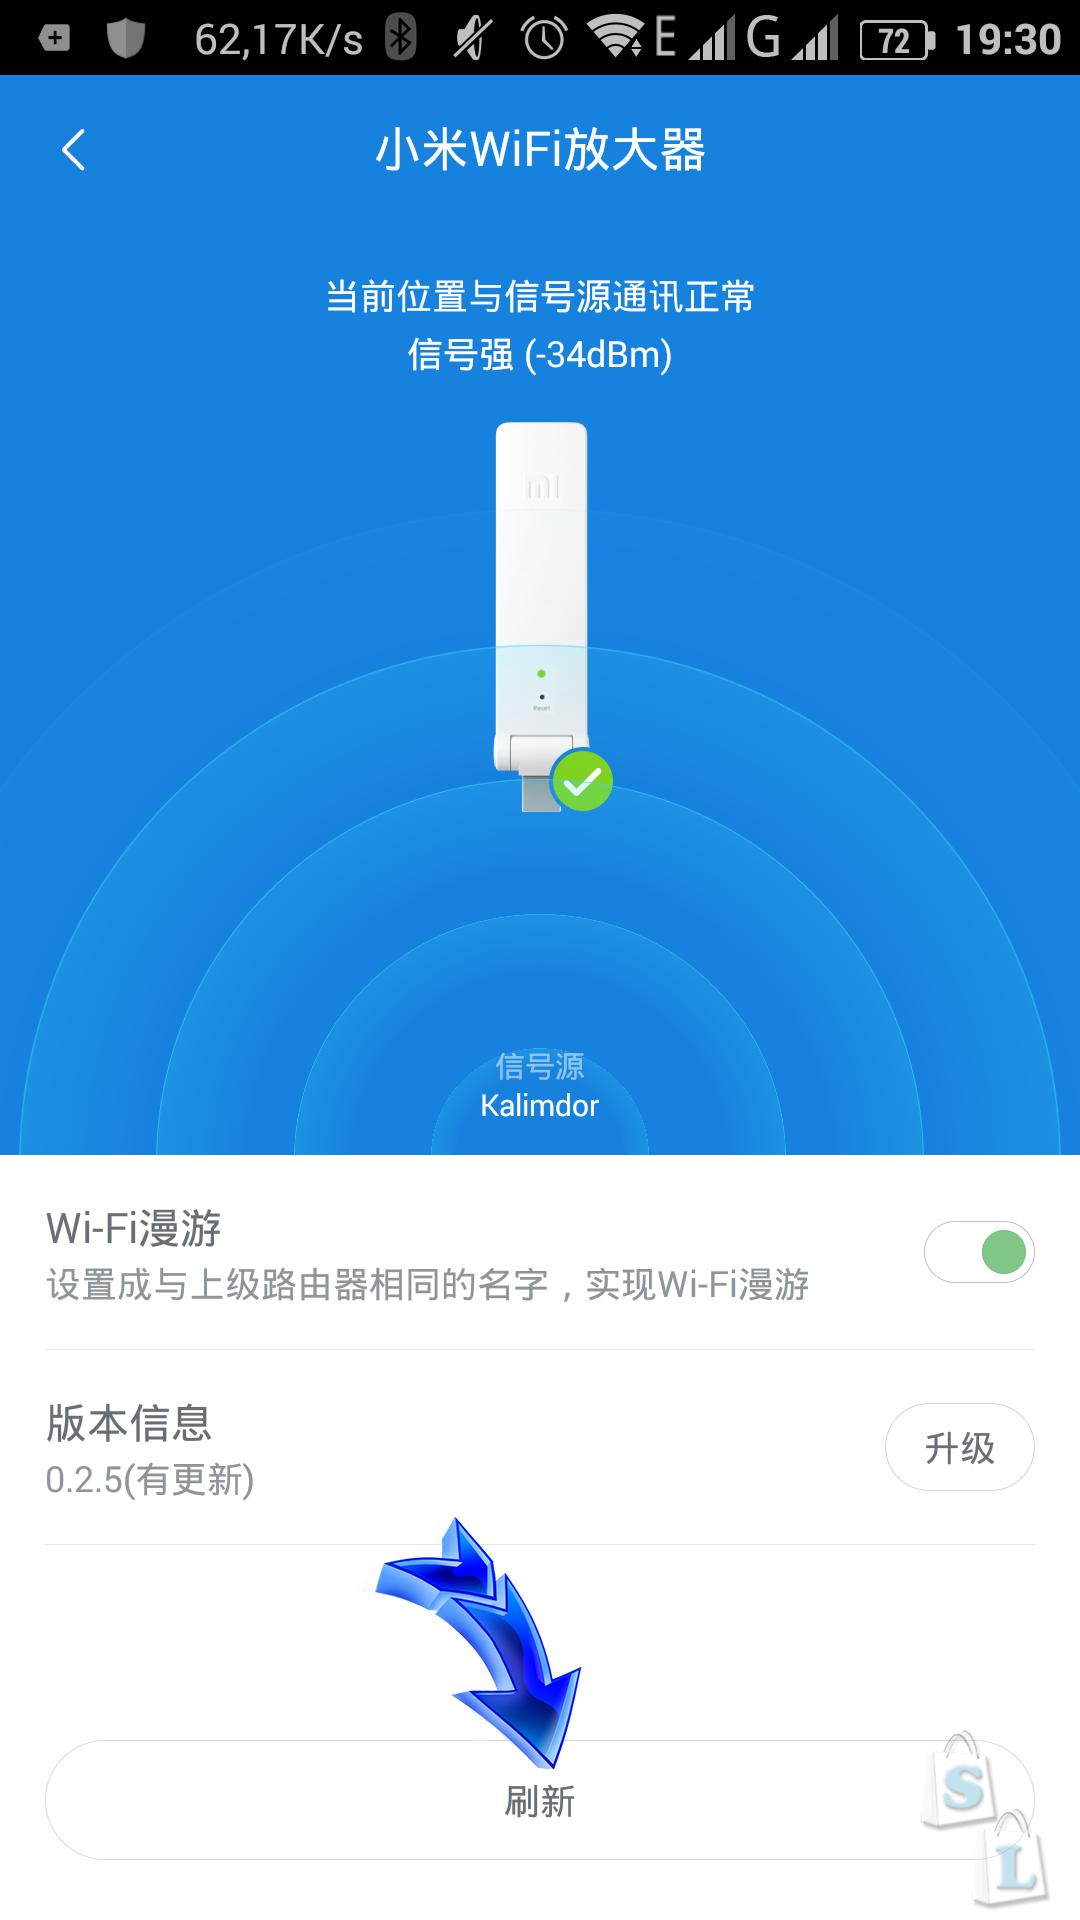 GearBest: XiaoMi Mi WiFi Amplifier обзор и настройка через Xiaomi Smart Home